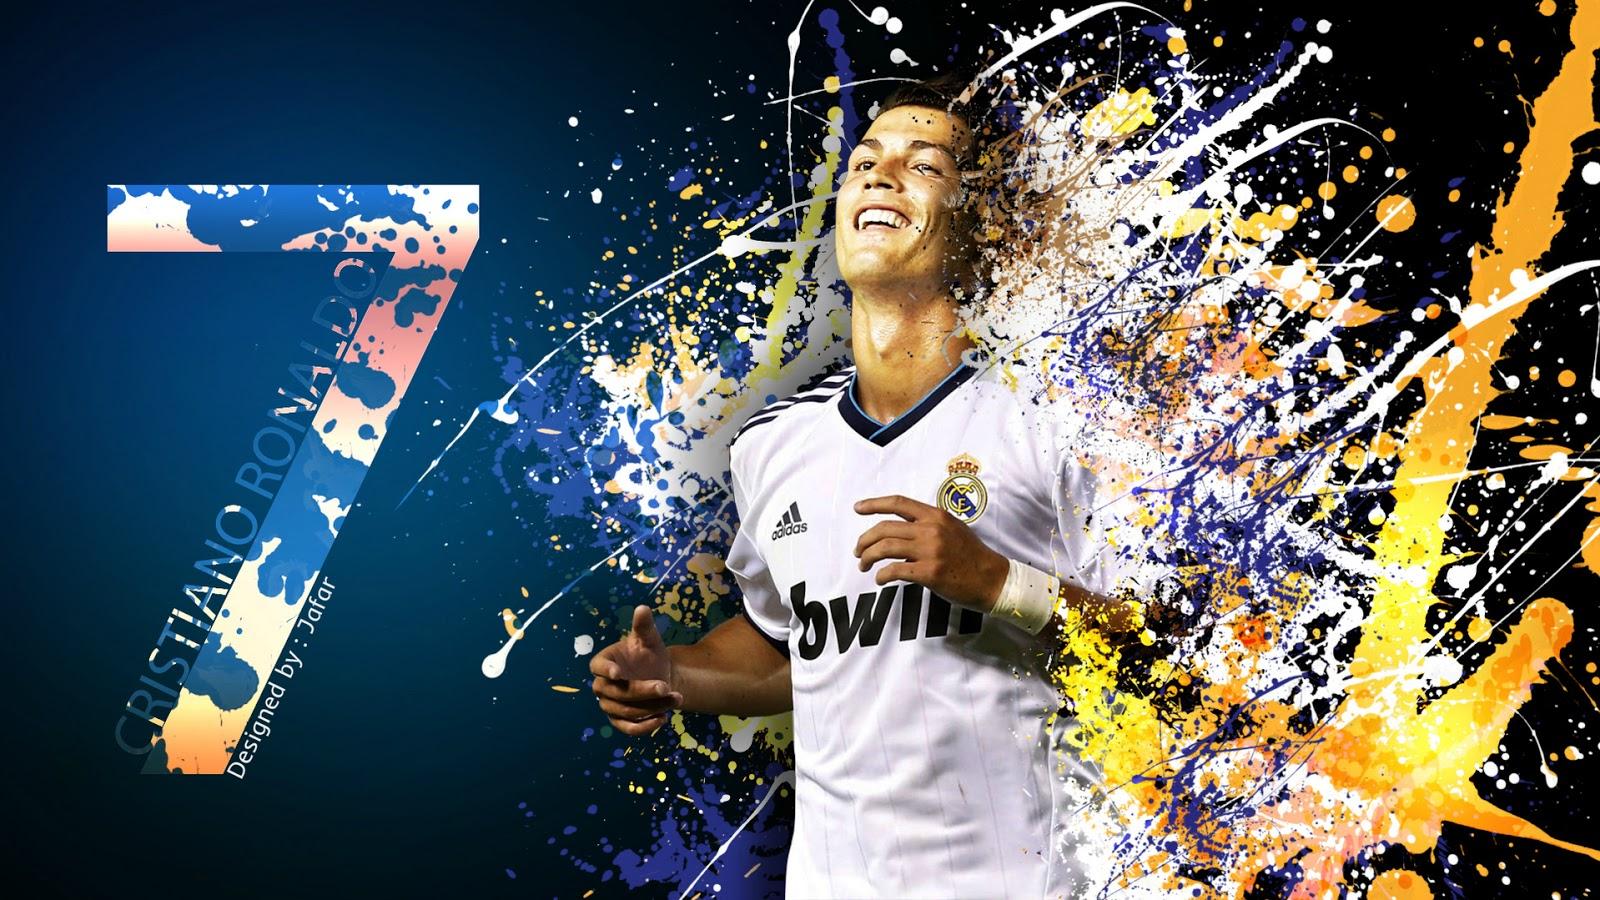 Cristiano Ronaldo 2013 Wallpapers FREE WALLPAPERS 1600x900